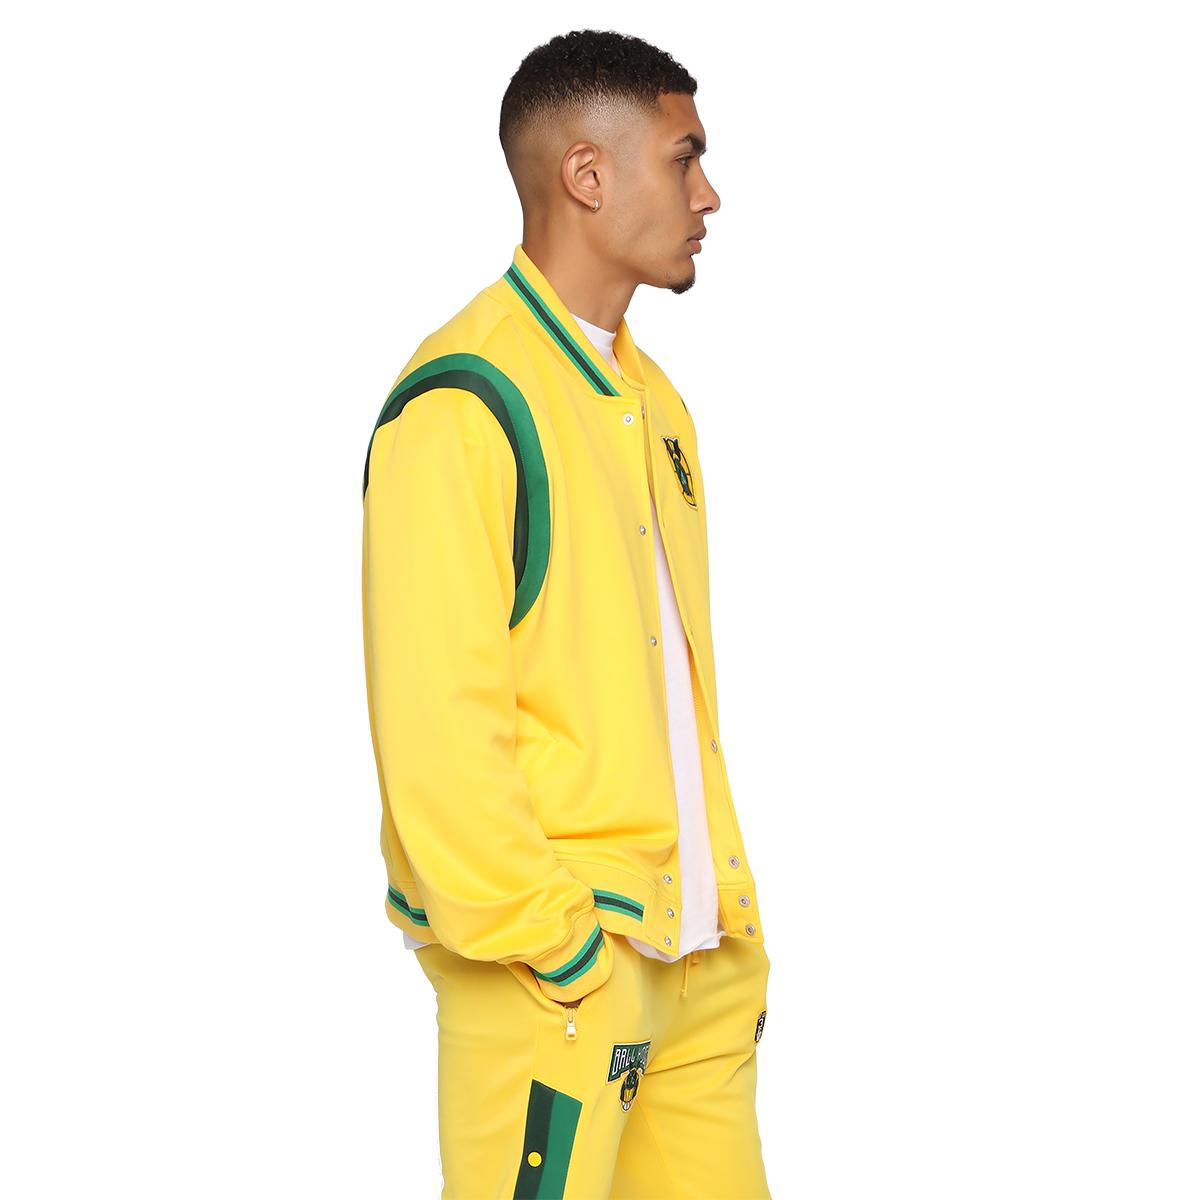 Team Ball Hogs Jacket - Yellow